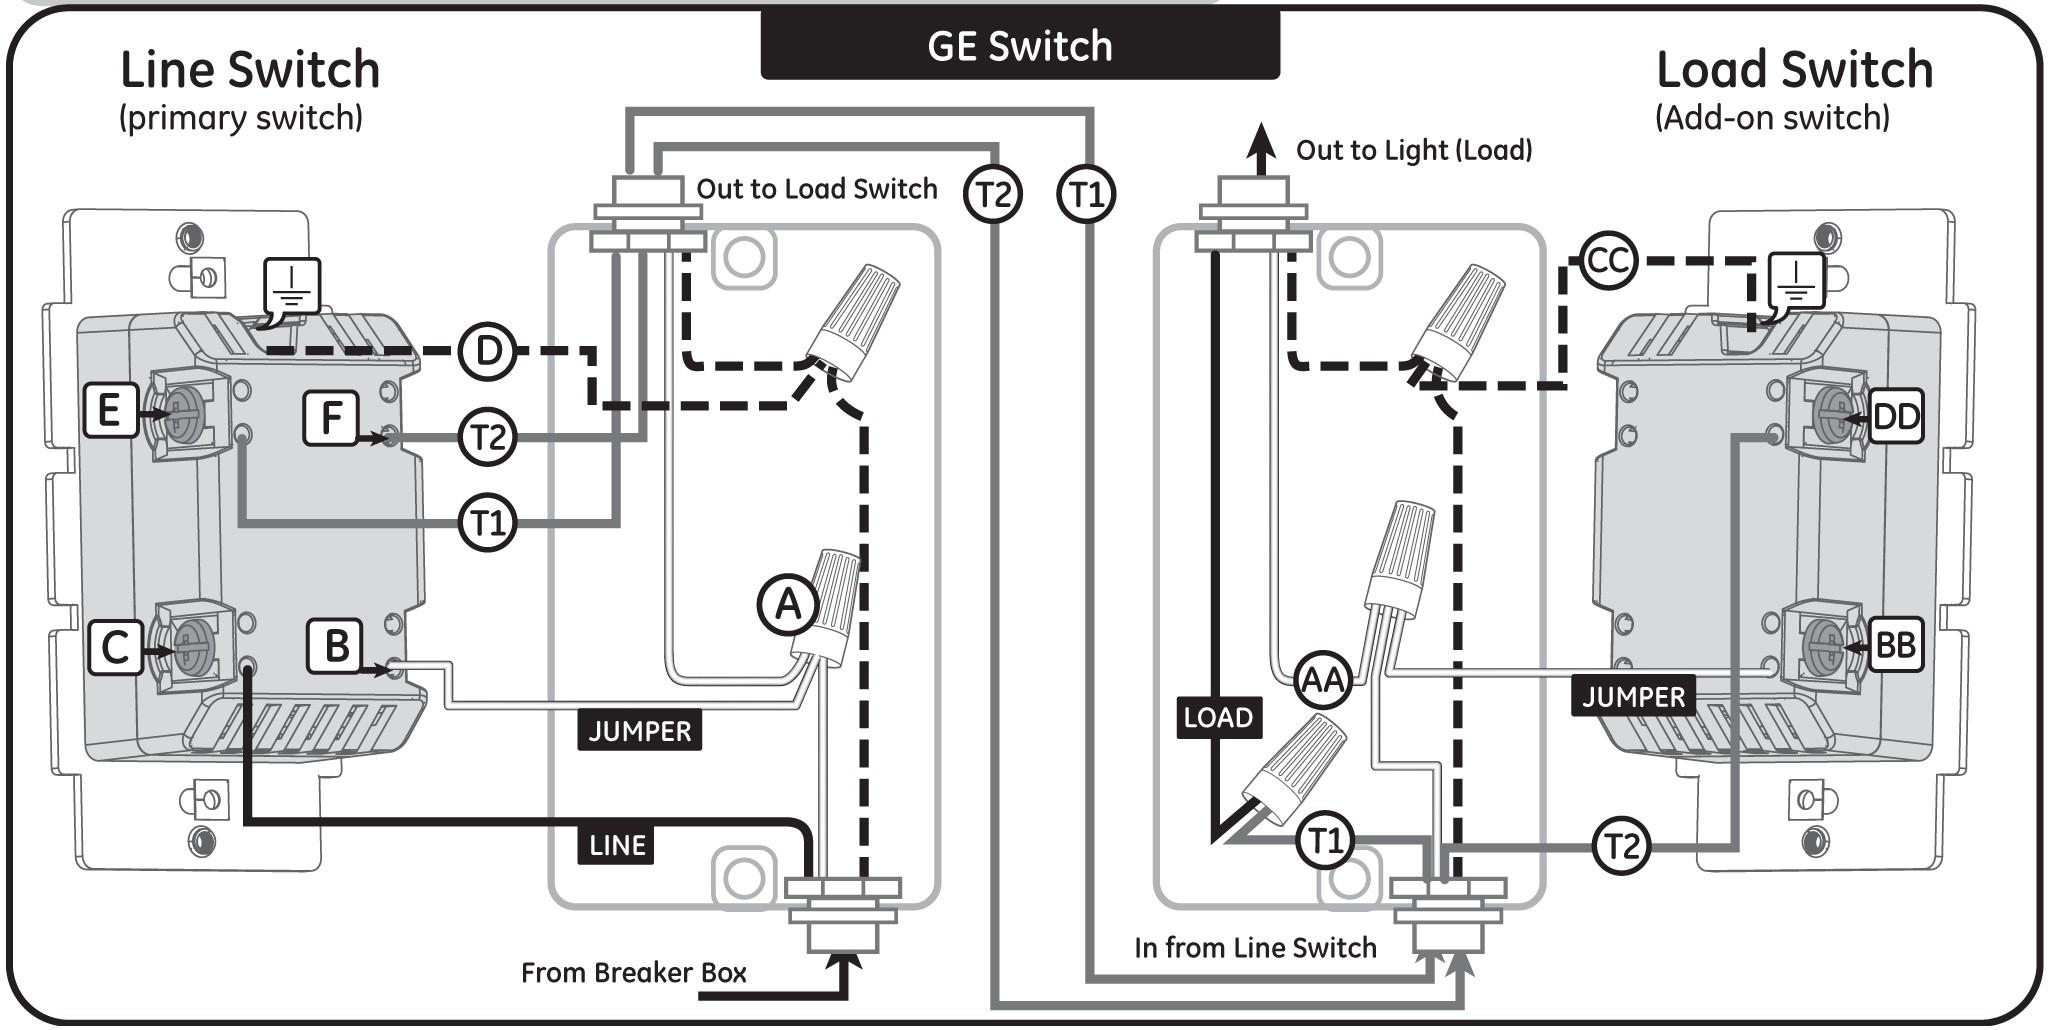 Ge Dimmer Switch Wiring Diagram Blogs And Schematic Box Gm Simple Schema Wire